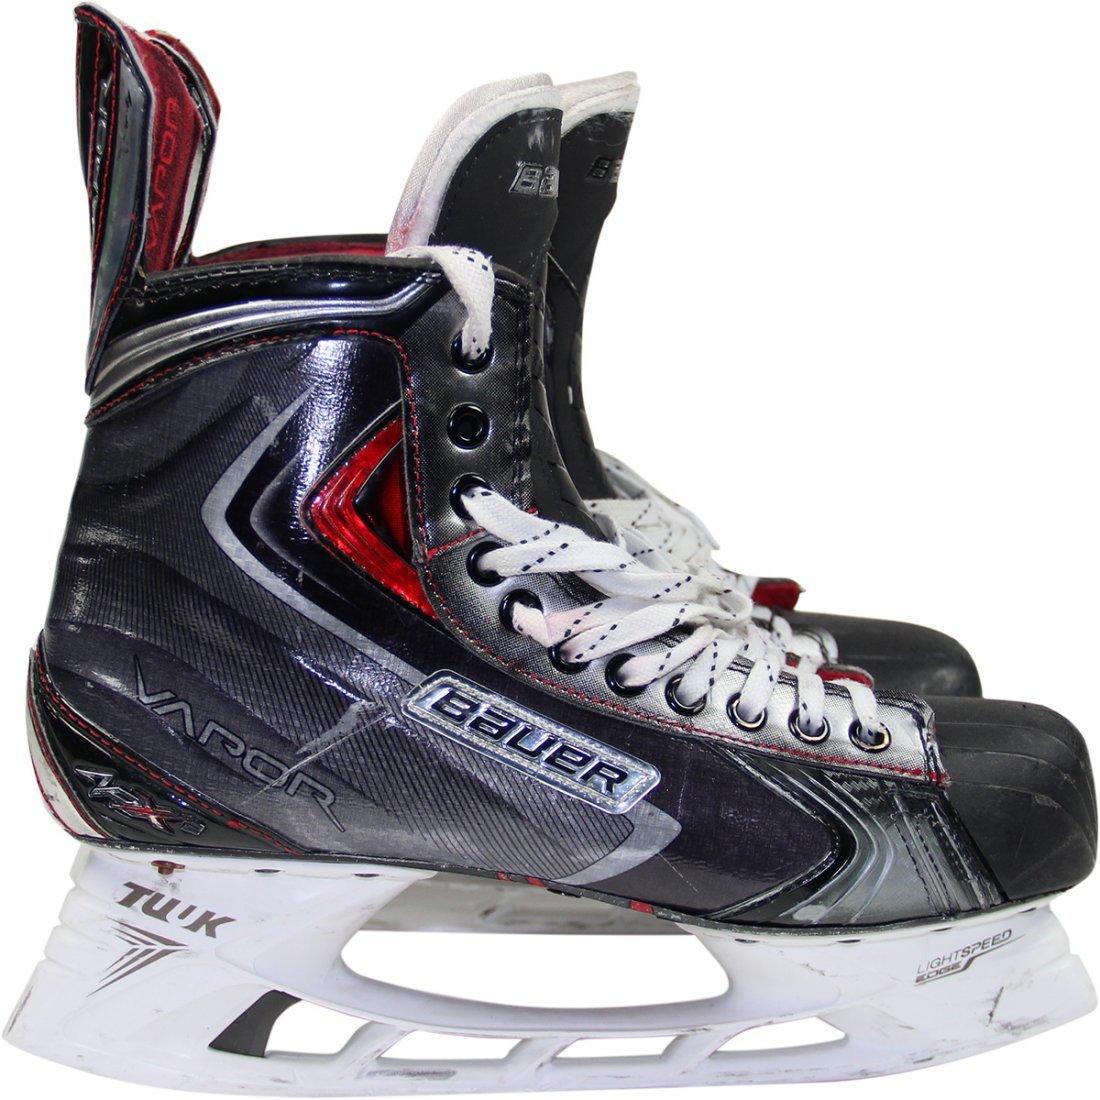 Kevin Klein Skates - New York Rangers Game Used #8 Skat